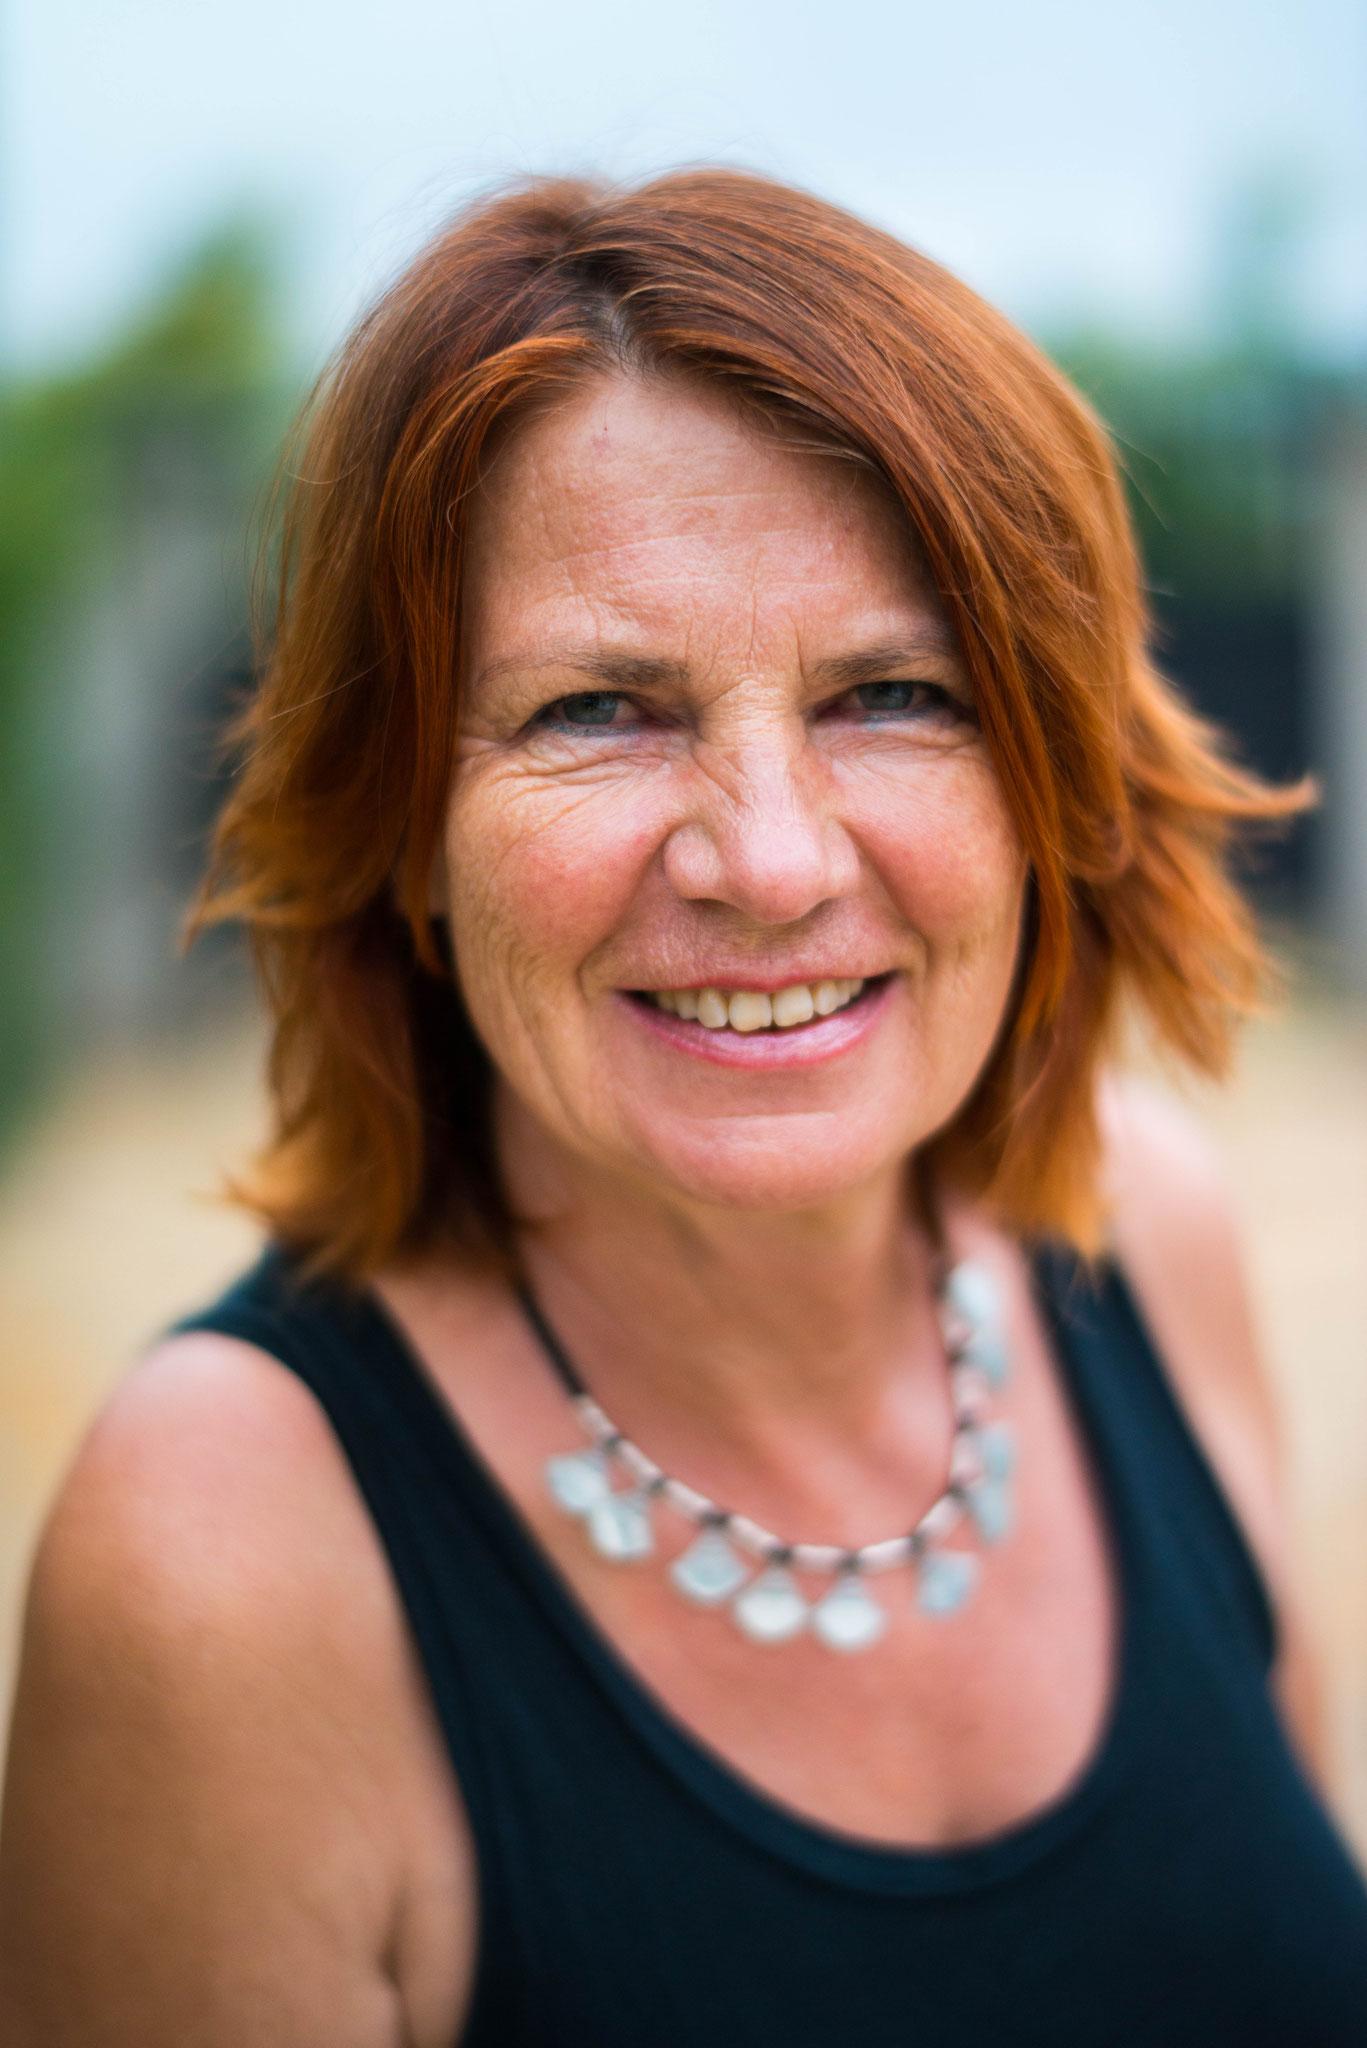 Hertha Schwaighofer, Obfrau & Gründerin